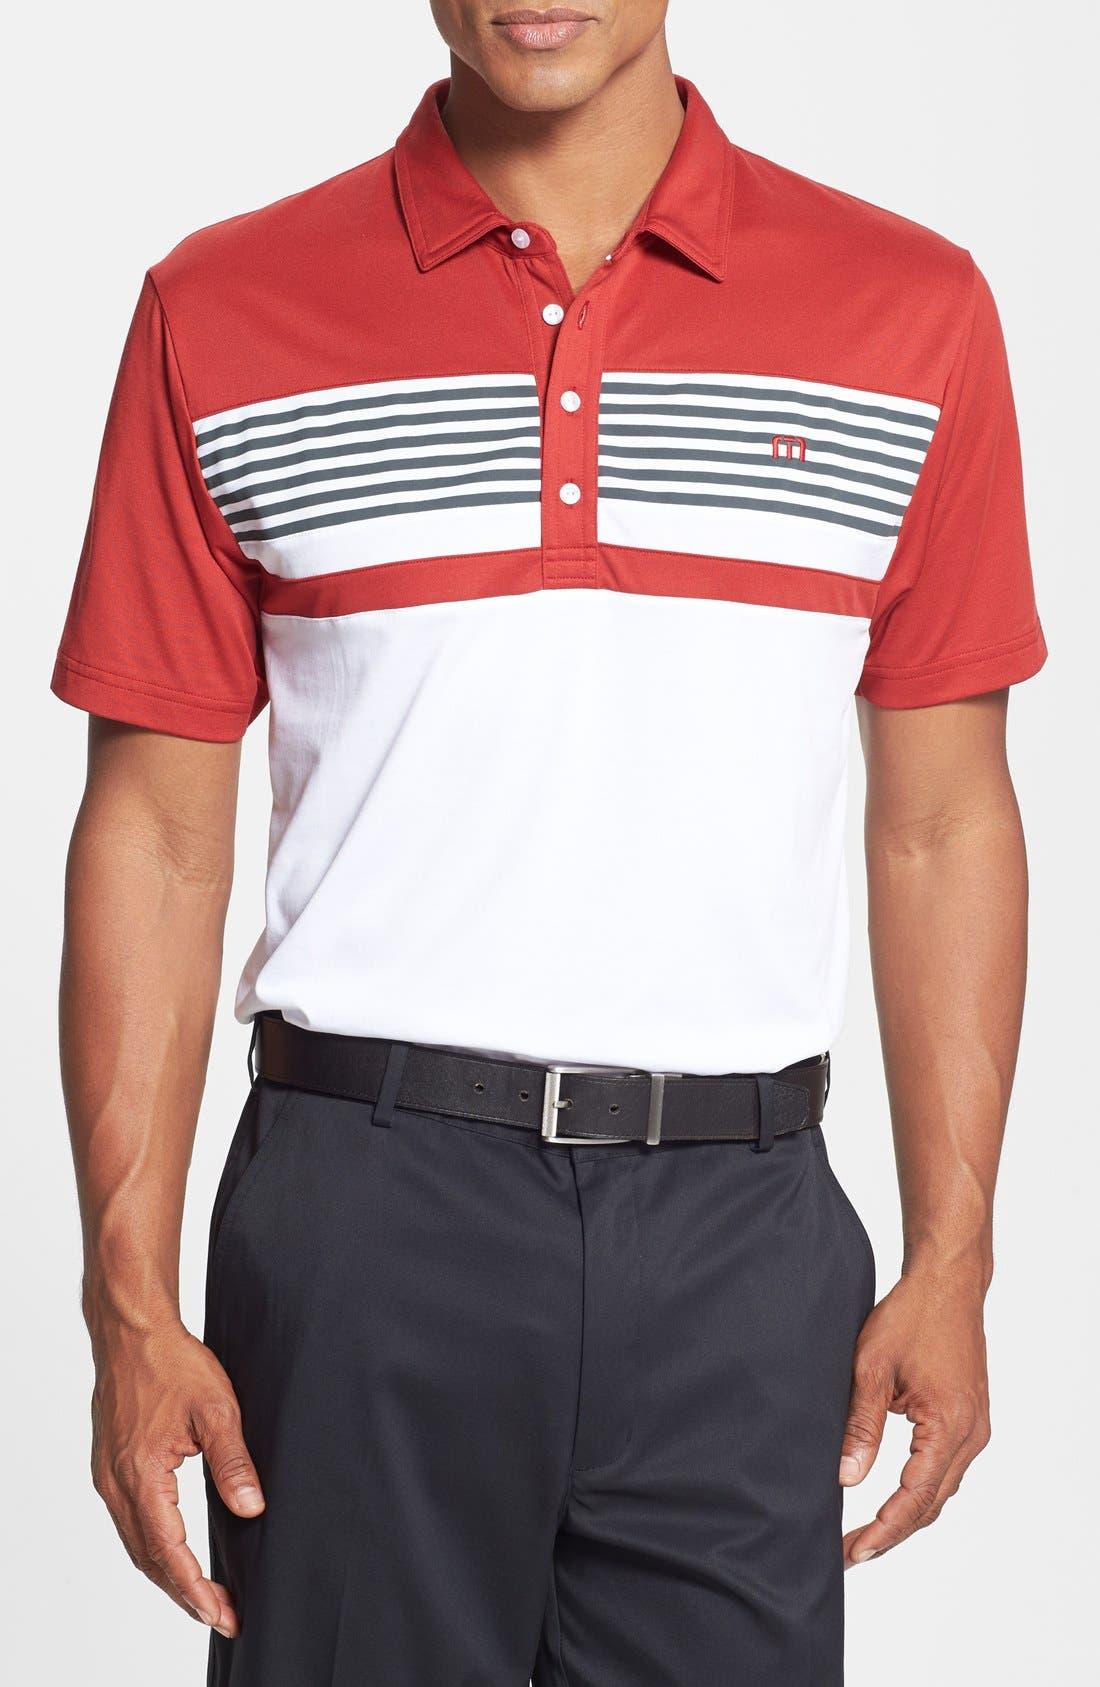 Alternate Image 1 Selected - Travis Mathew 'Kurkova' Trim Fit Performance Golf Polo